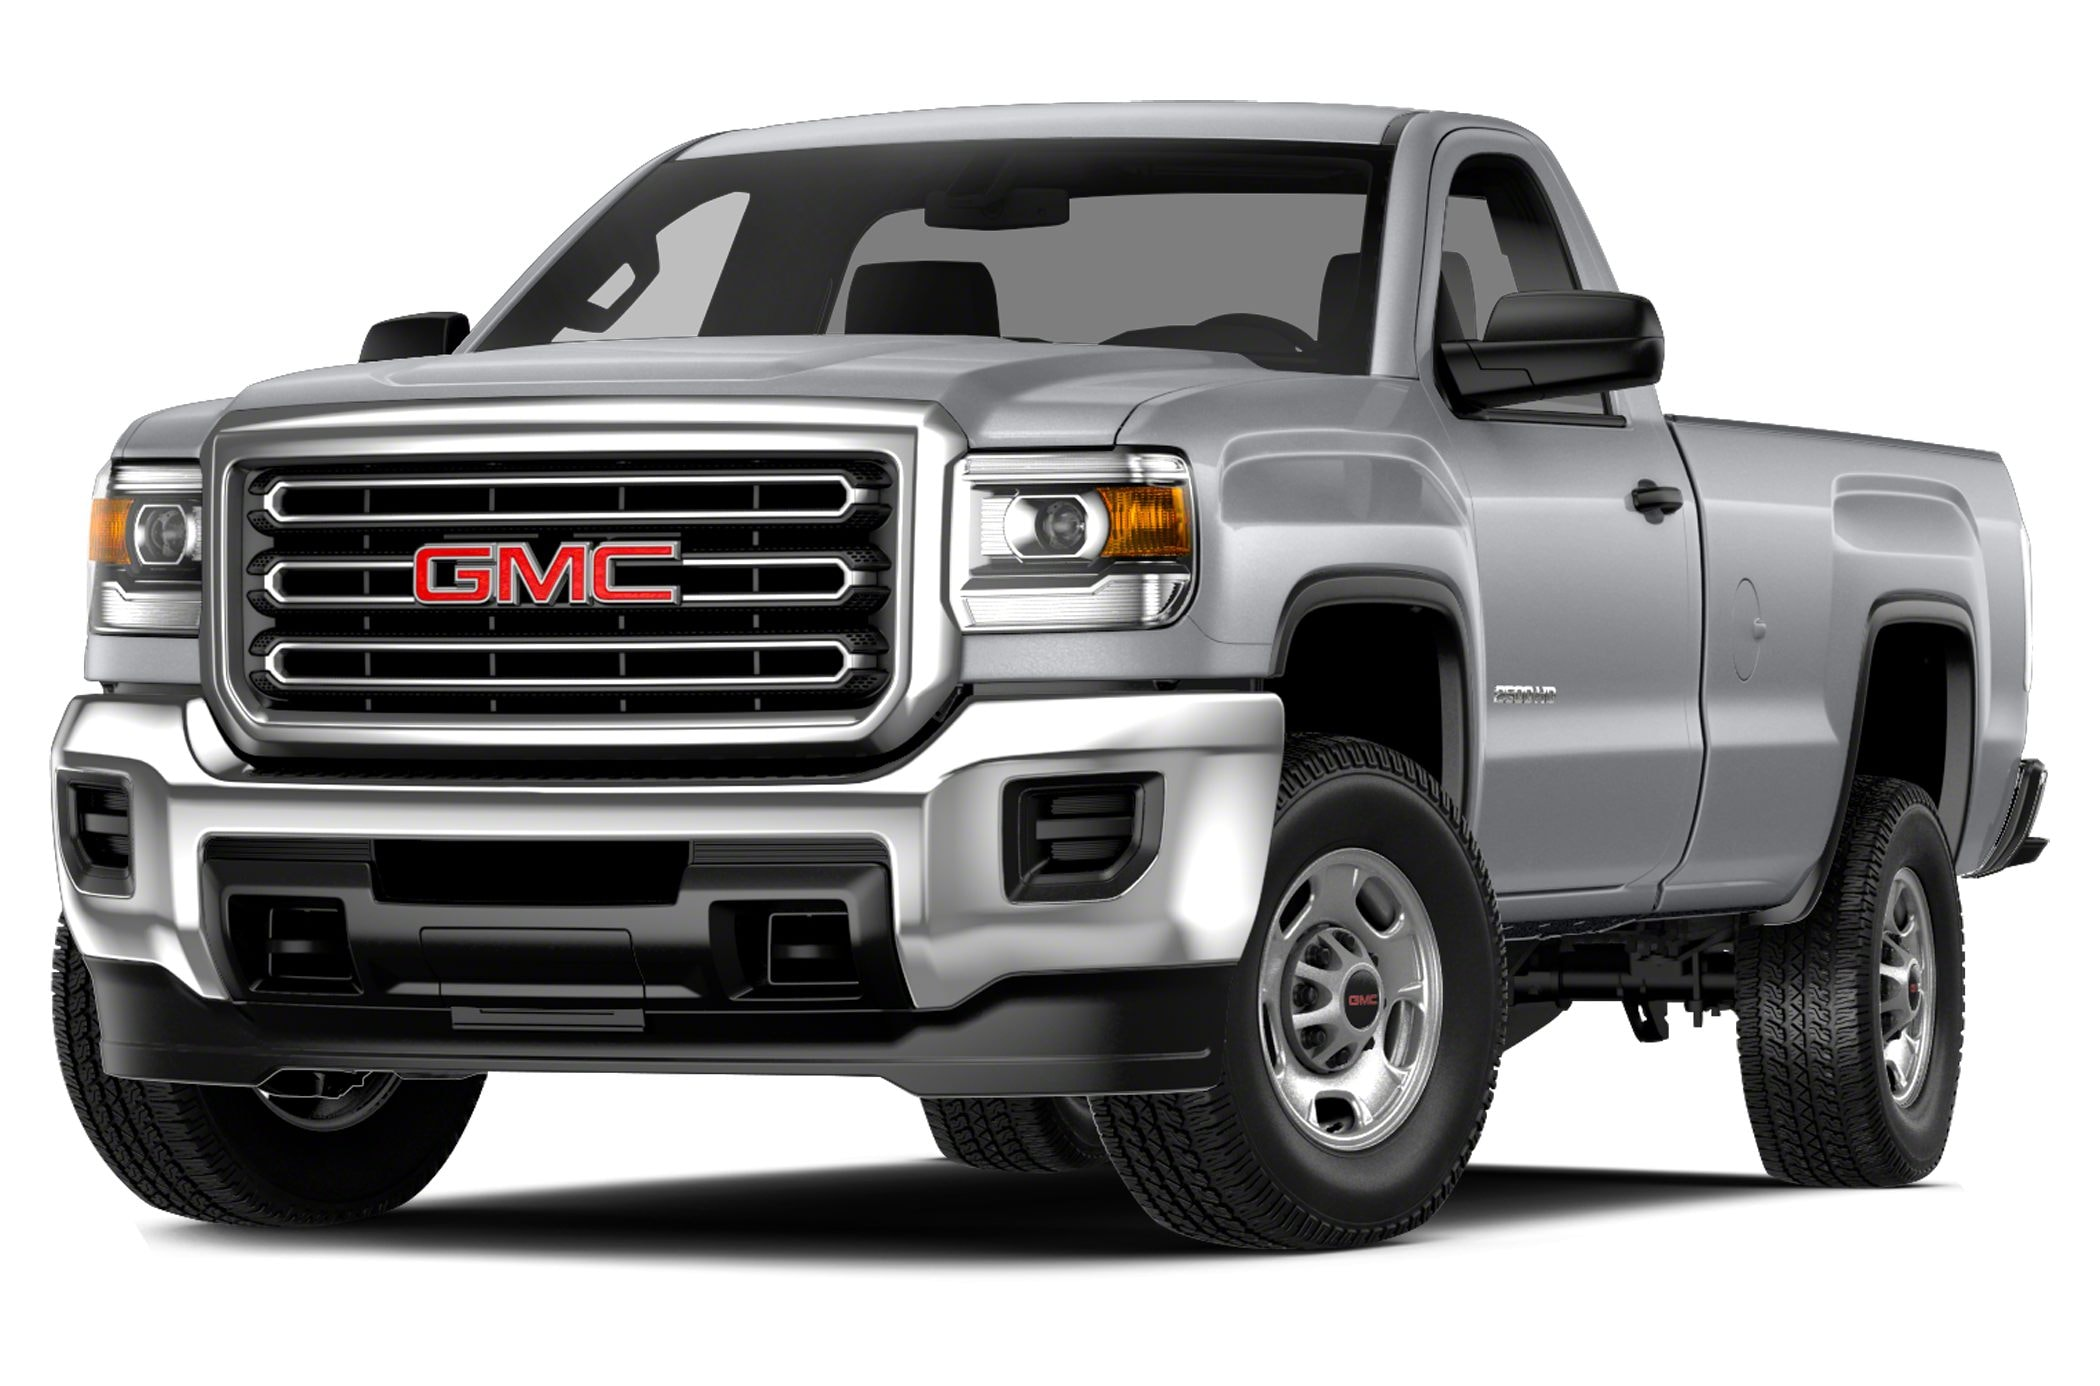 Gmc Acadia Lease Deals >> Murray Chevrolet Cadillac Buick GMC Brandon | New Buick ...